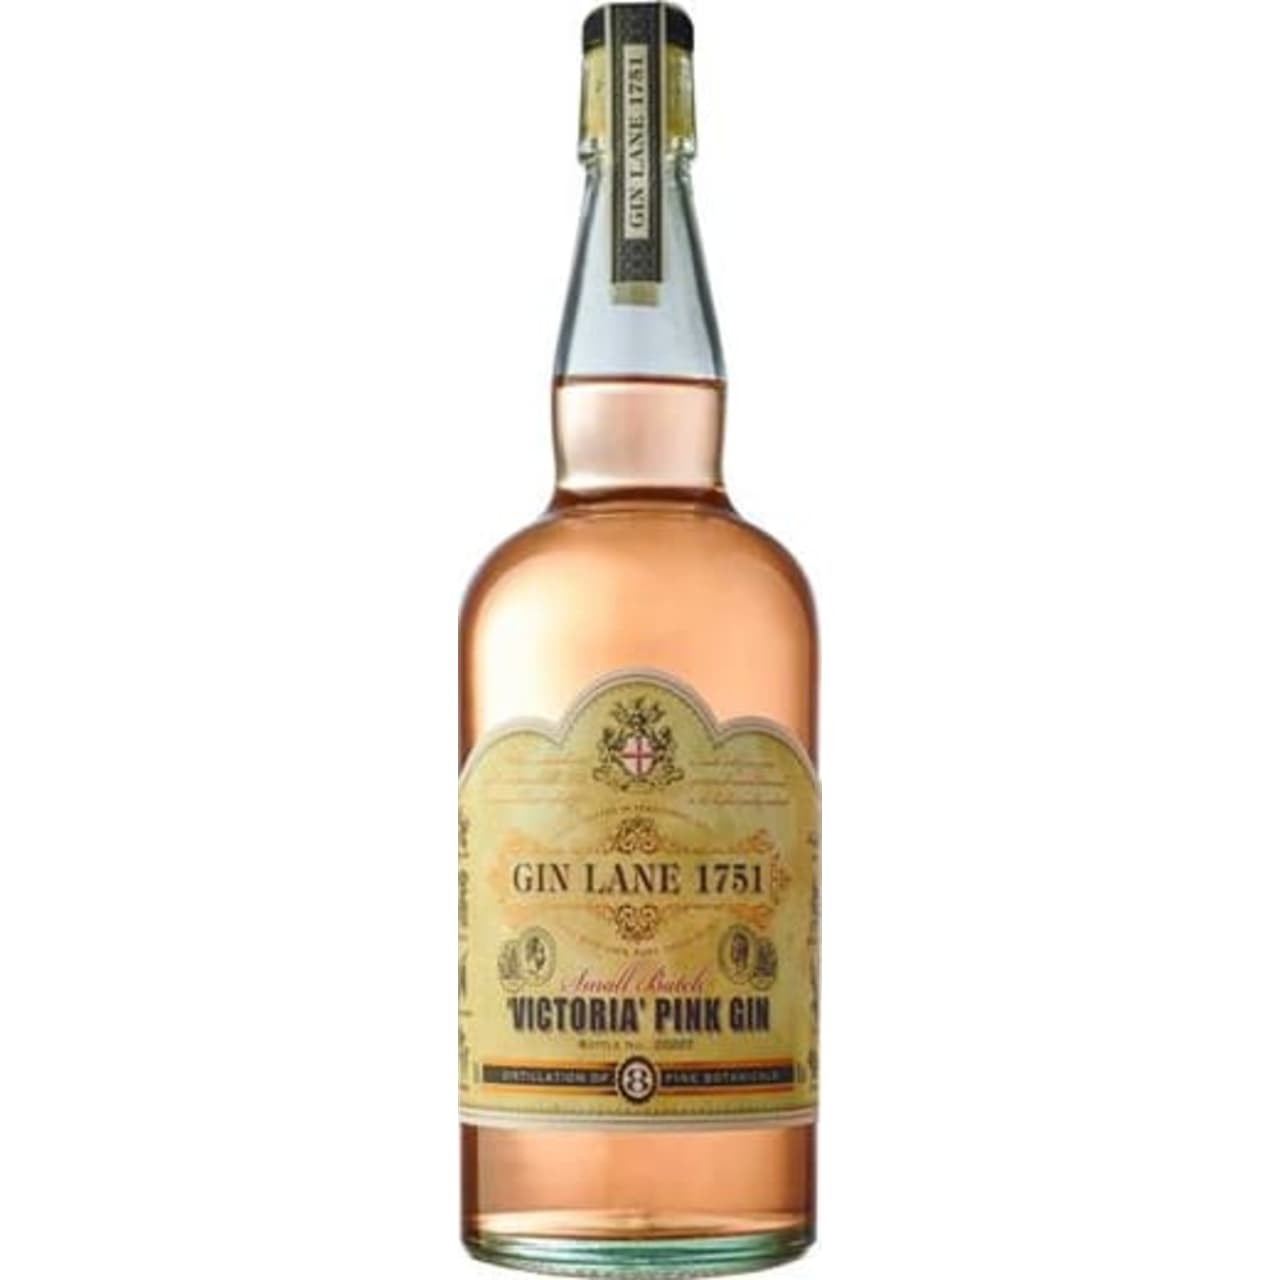 Product Image - Gin Lane 1751 Victoria Pink Gin